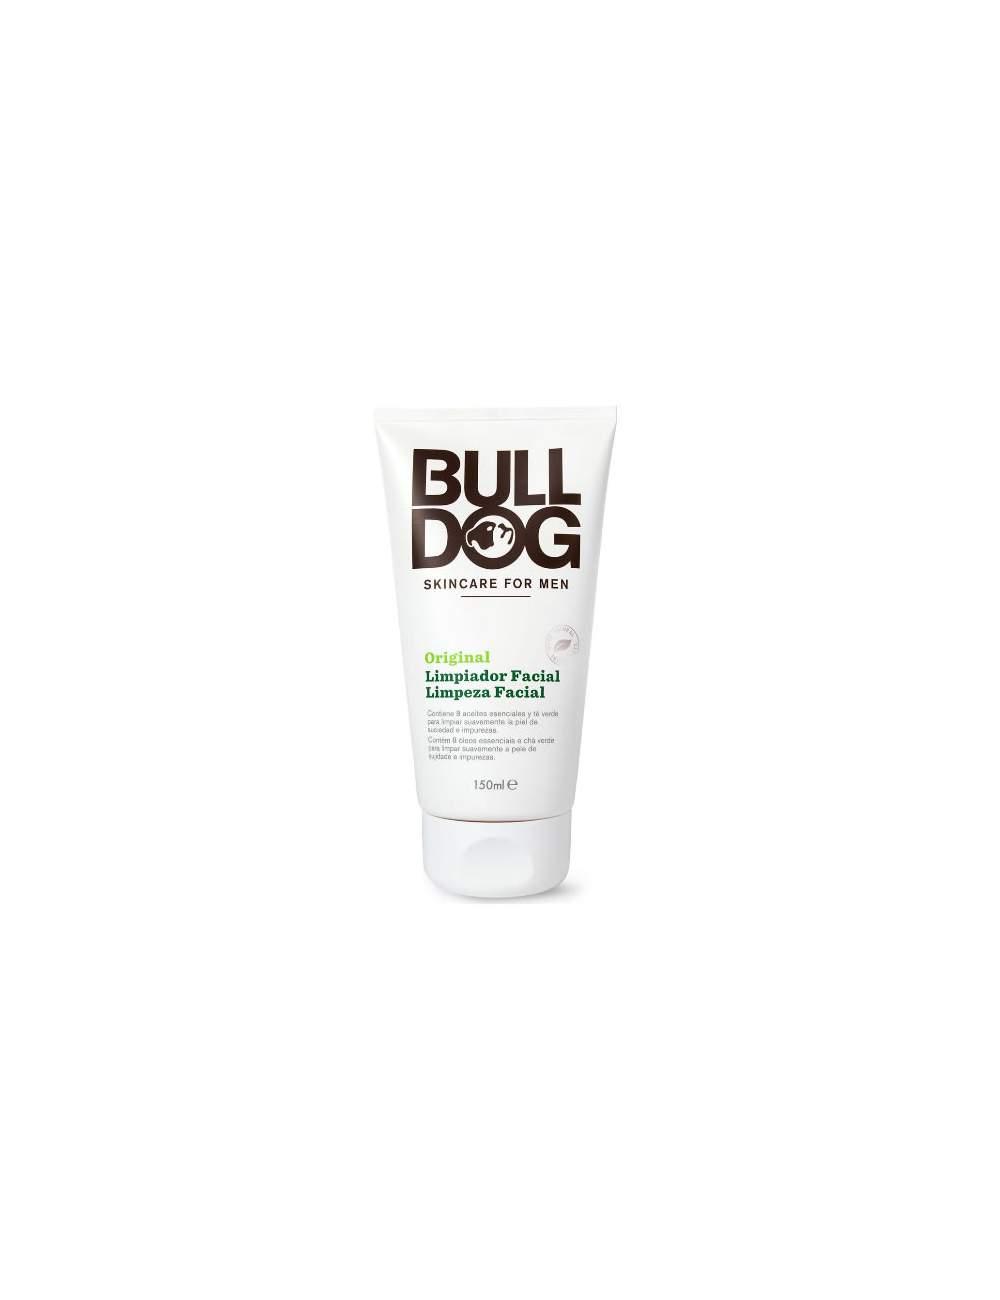 Limpiador Facial Natural para Hombres Original. Bulldog Skincare